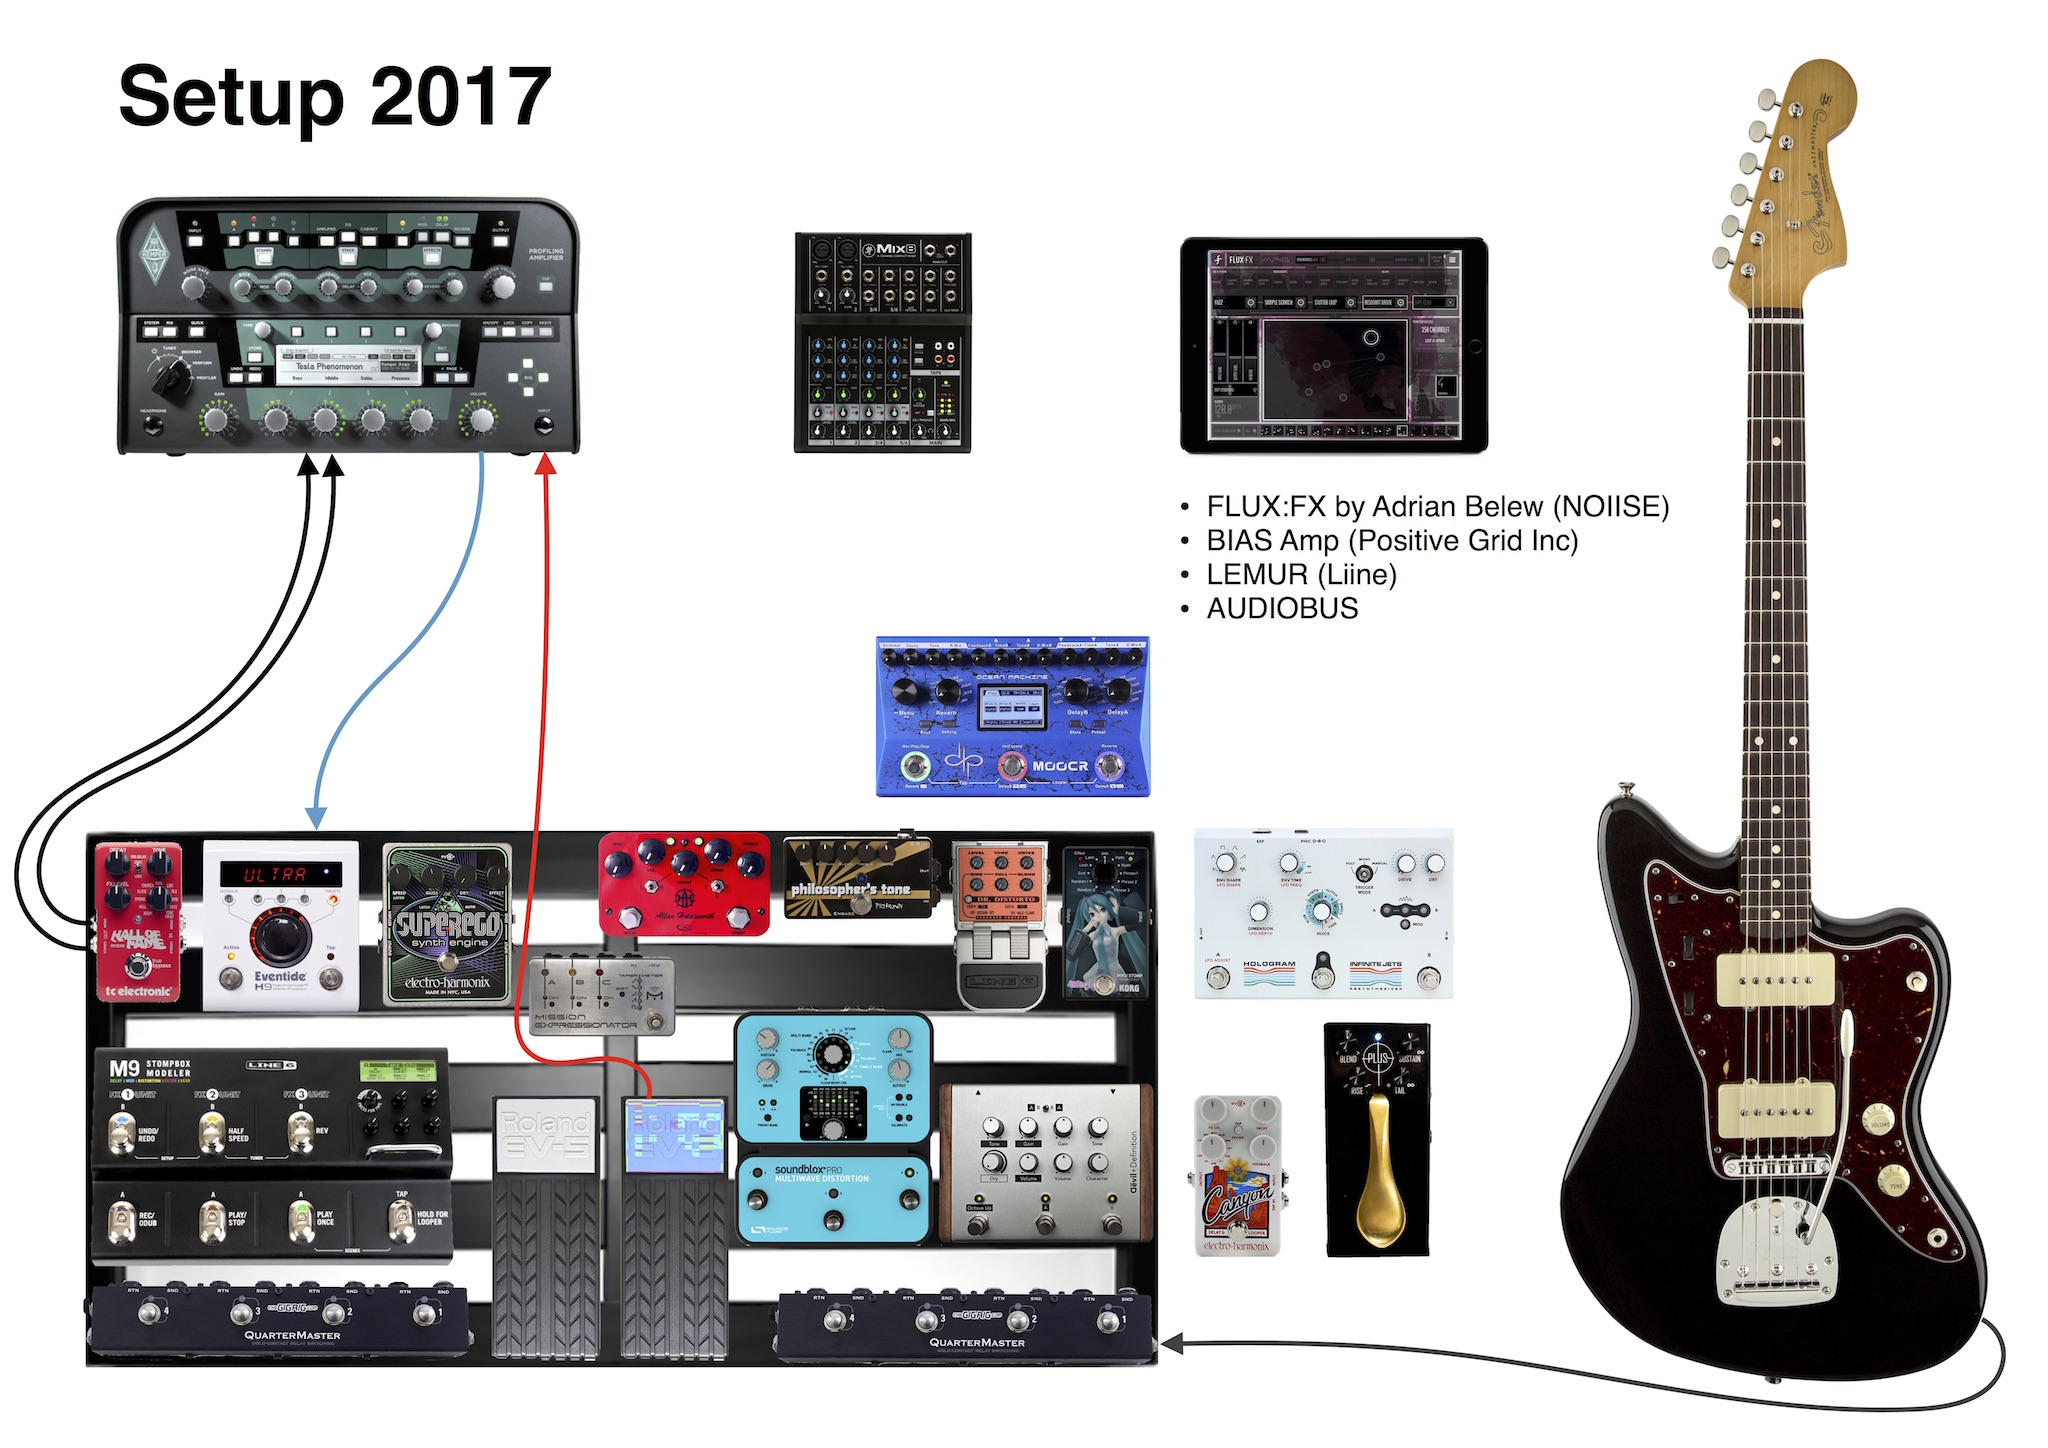 pedalboard_gear_kemper_hologram_infinite-jets_plus_pedal_mobgen_flux_belew_source_audio_rockett_holdsworth.jpg